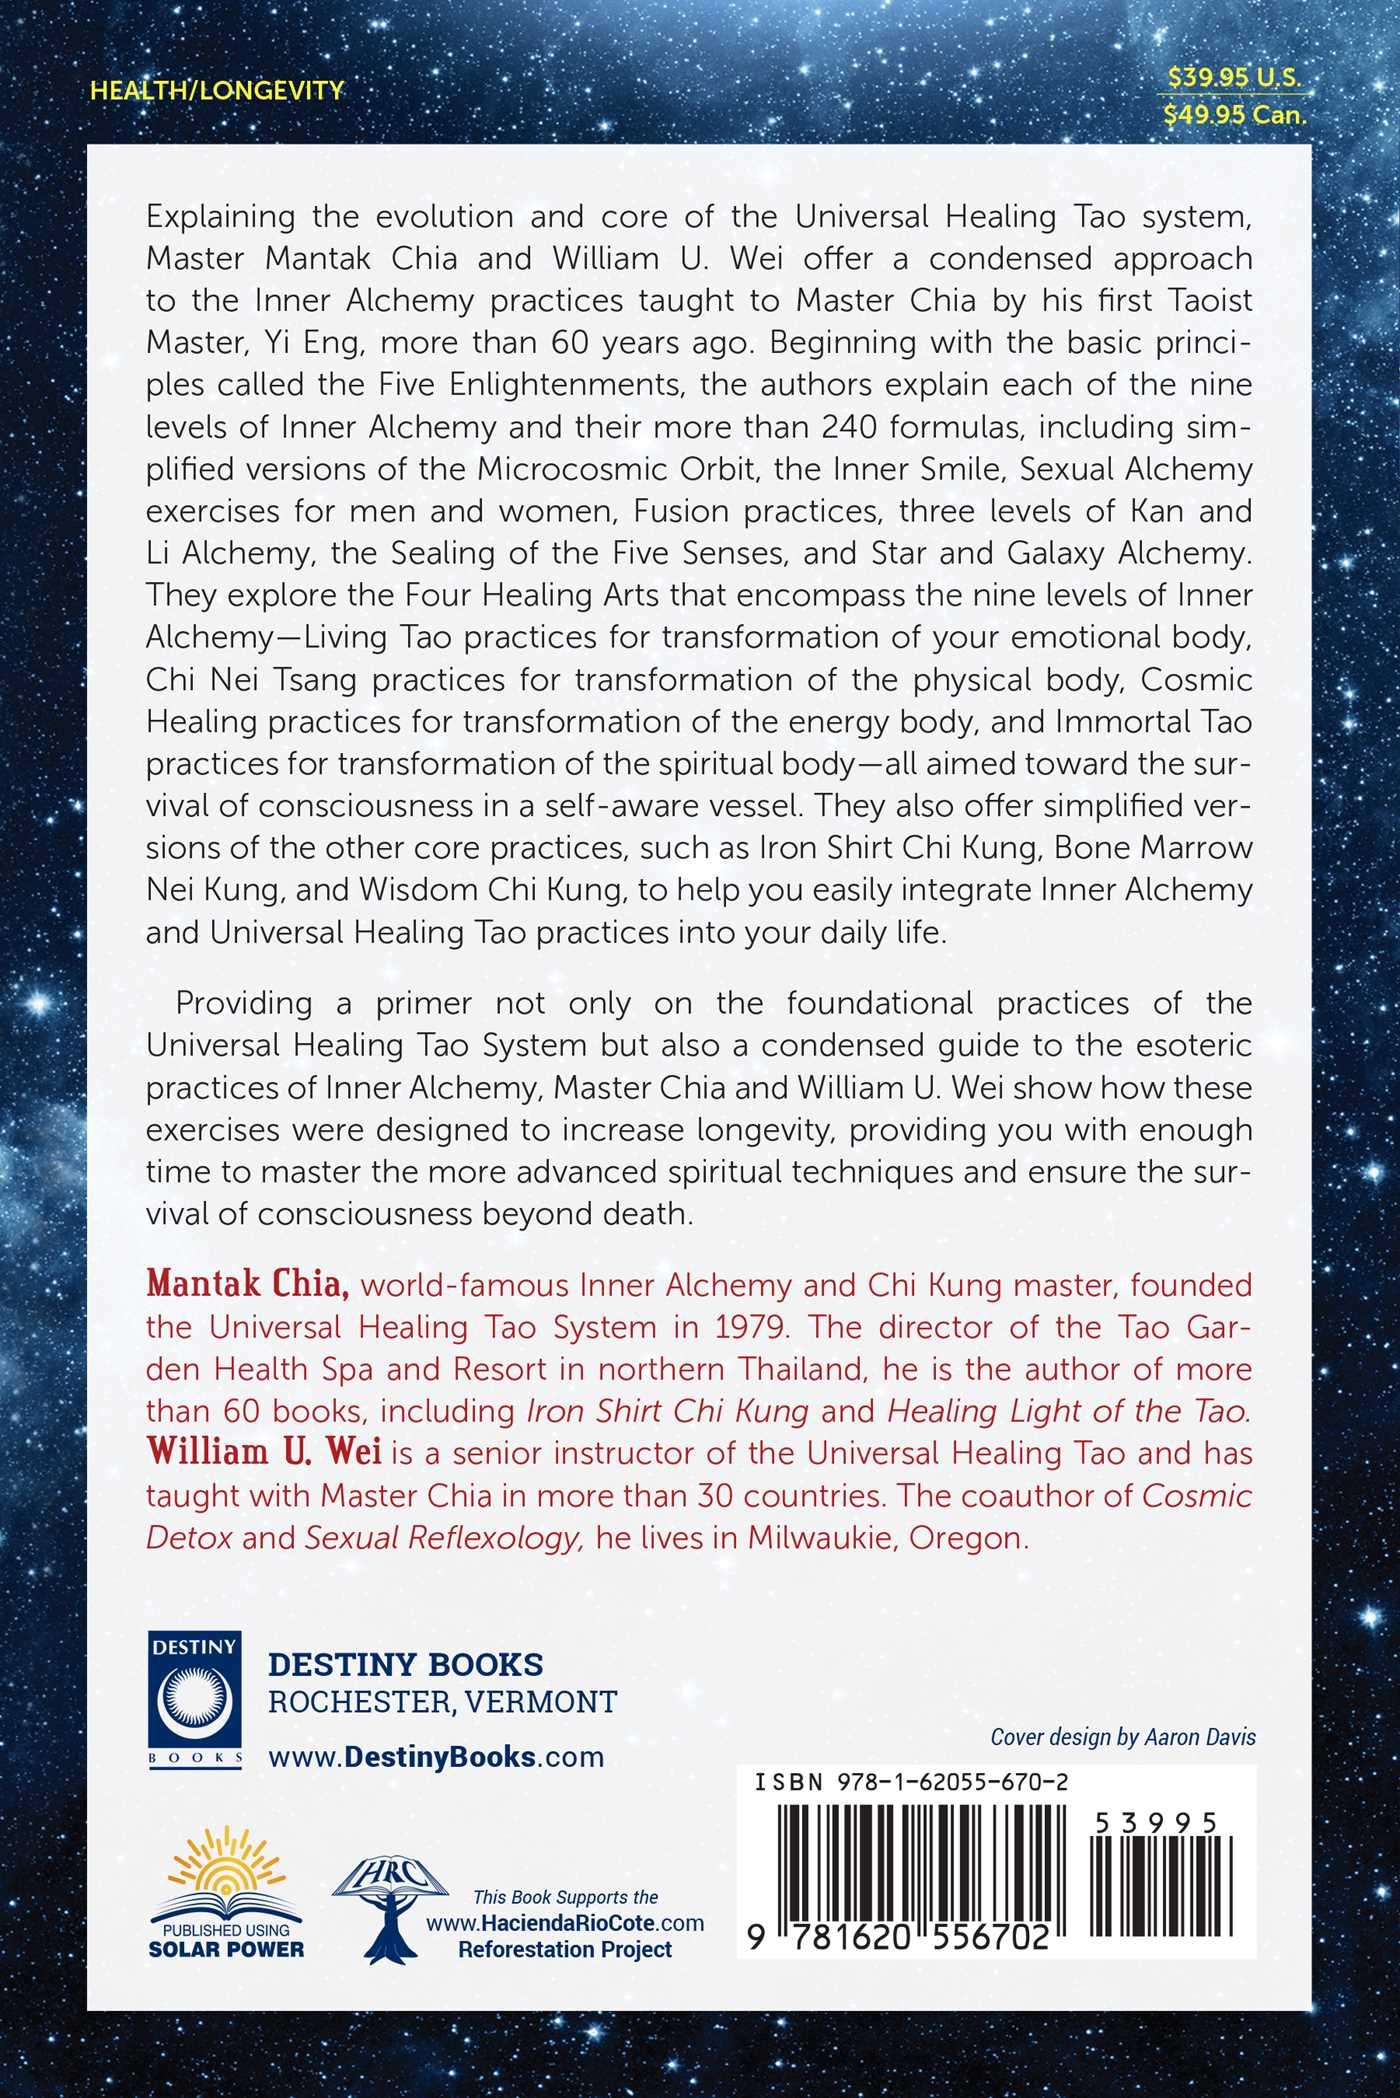 tao system book